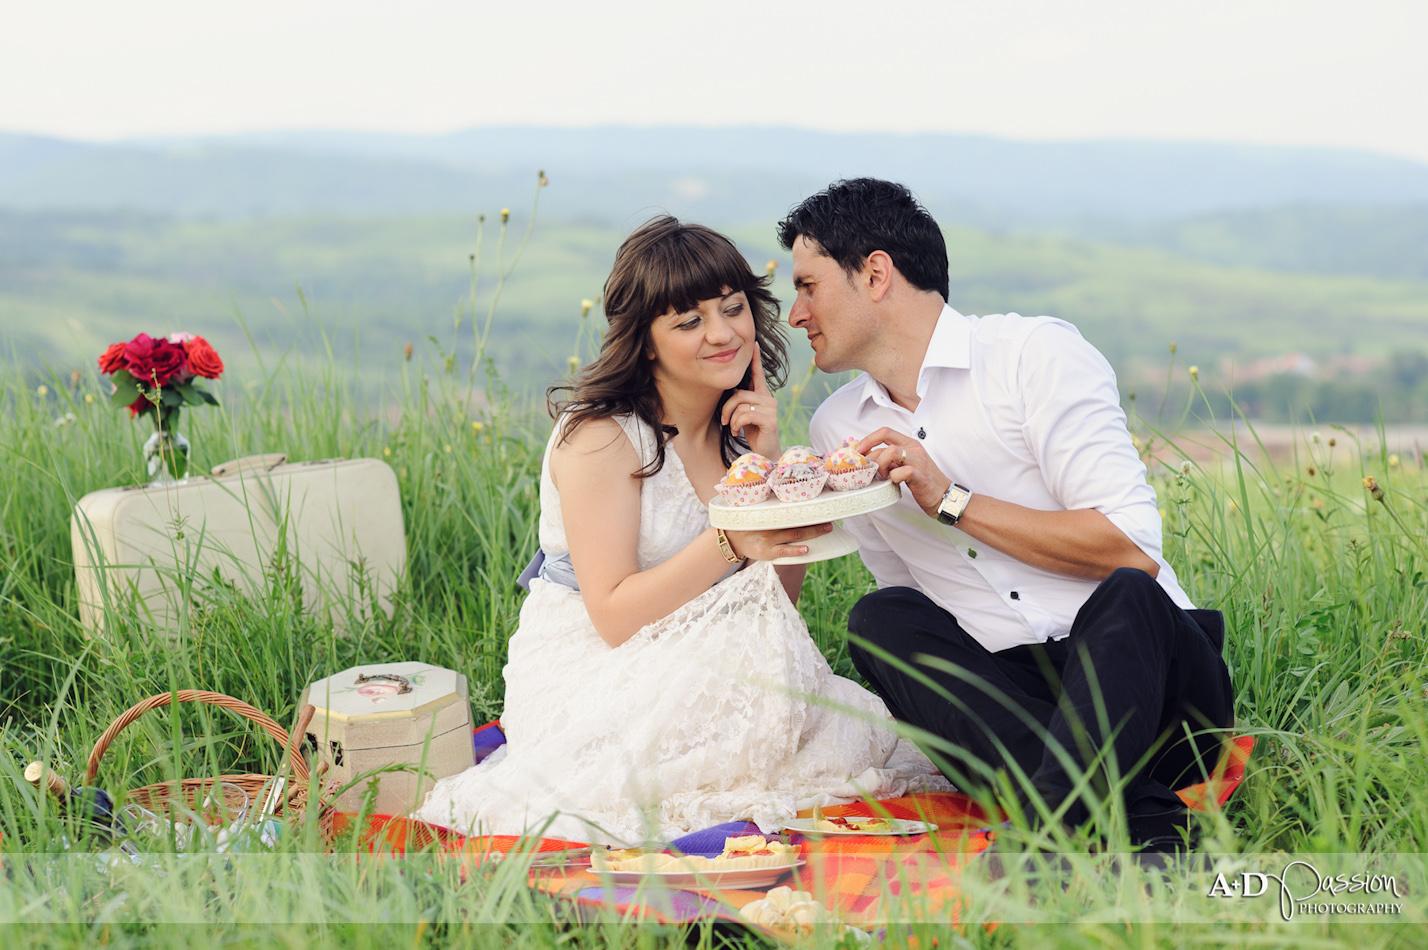 AD Passion Photography | 07042012_fotograf-profesionist-nunta_after-wedding_carmen-si-costi_0046 | Adelin, Dida, fotograf profesionist, fotograf de nunta, fotografie de nunta, fotograf Timisoara, fotograf Craiova, fotograf Bucuresti, fotograf Arad, nunta Timisoara, nunta Arad, nunta Bucuresti, nunta Craiova